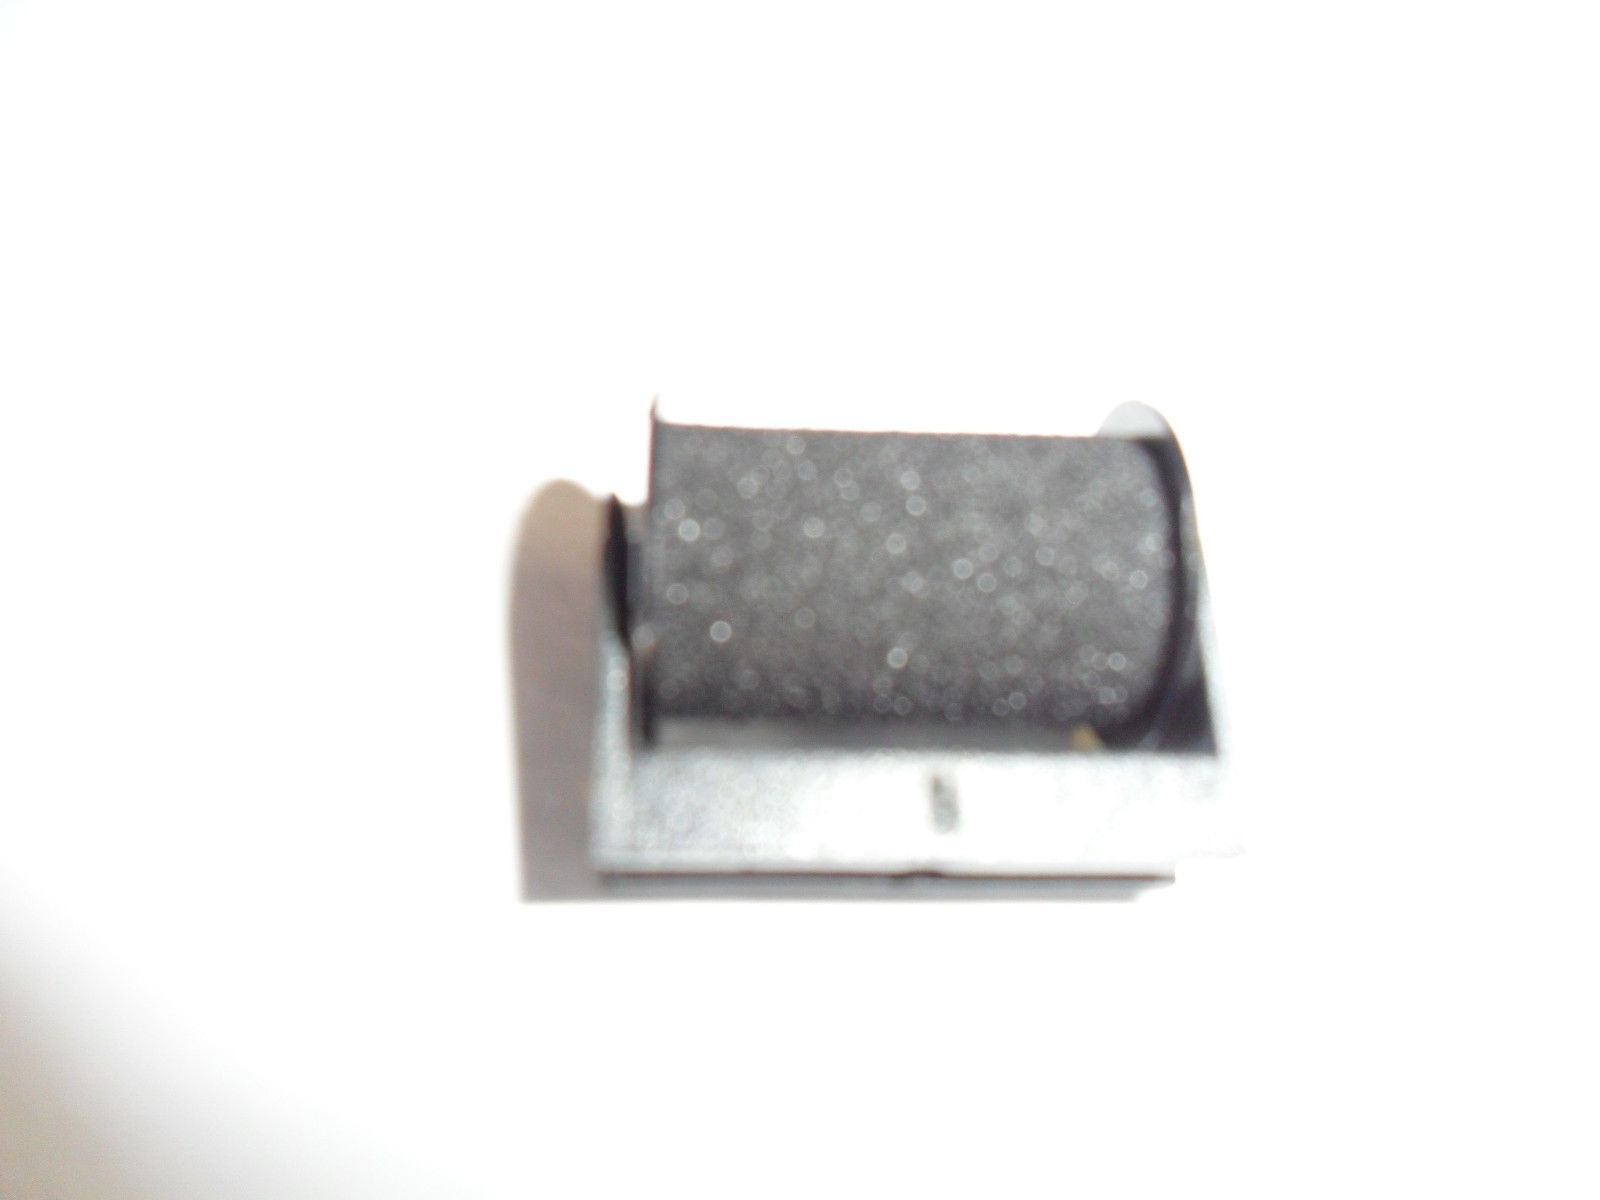 Dennison Sato IMS 180/IMS 216/IMS 220/IMS 230 Pricing Gun Ink Roller (2 Pack)